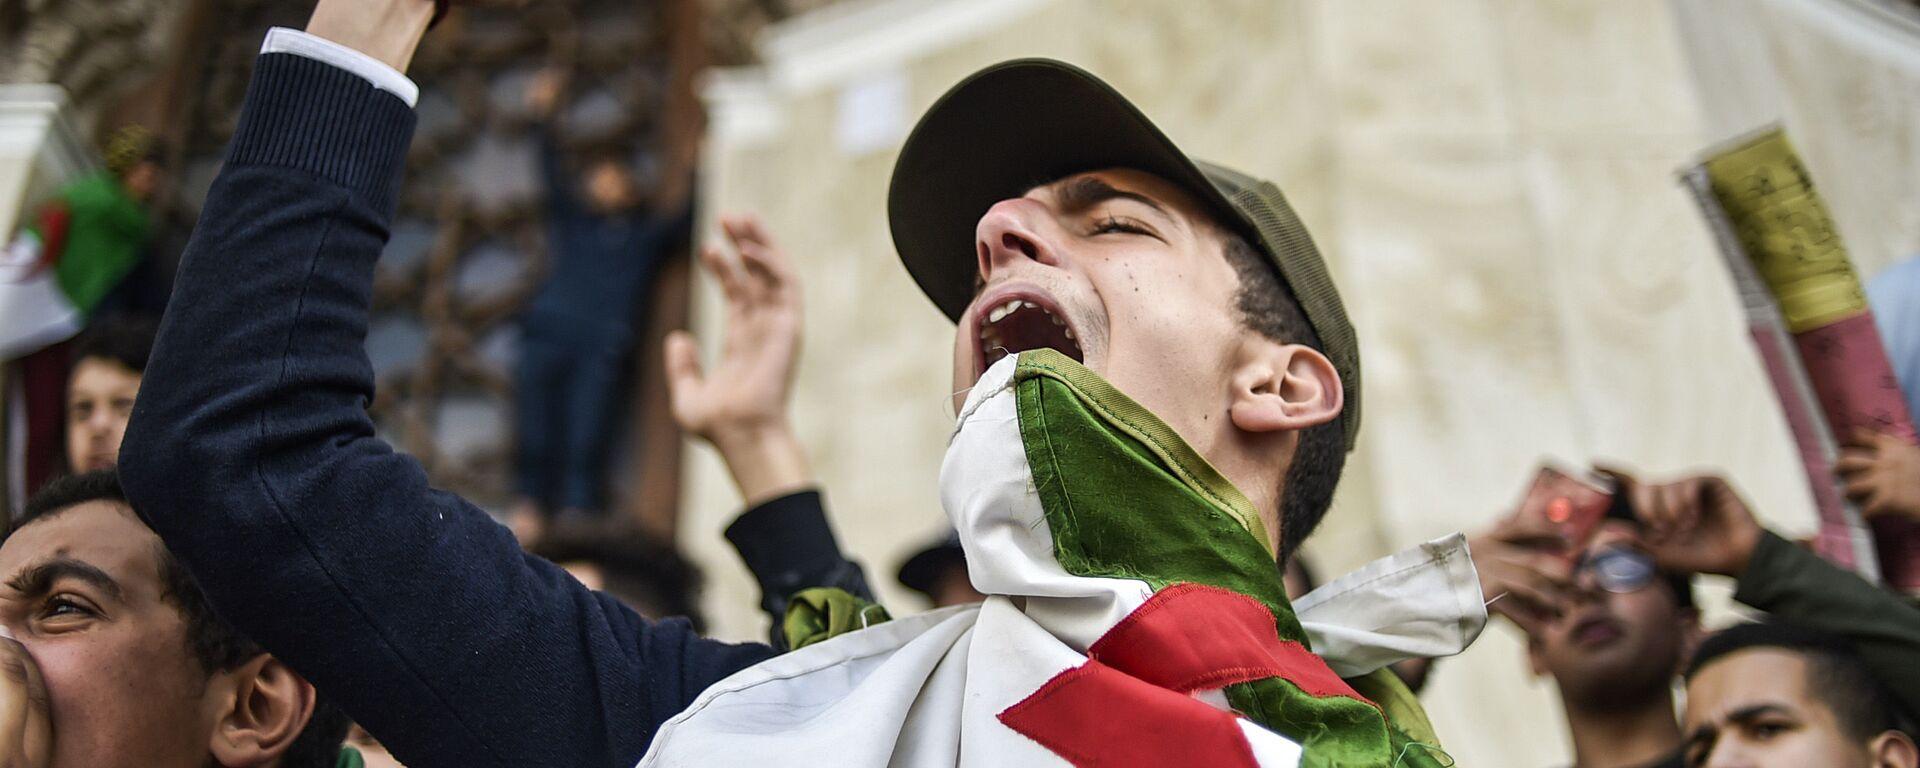 Le manifestazioni contro Bouteflika - Sputnik Italia, 1920, 15.03.2019